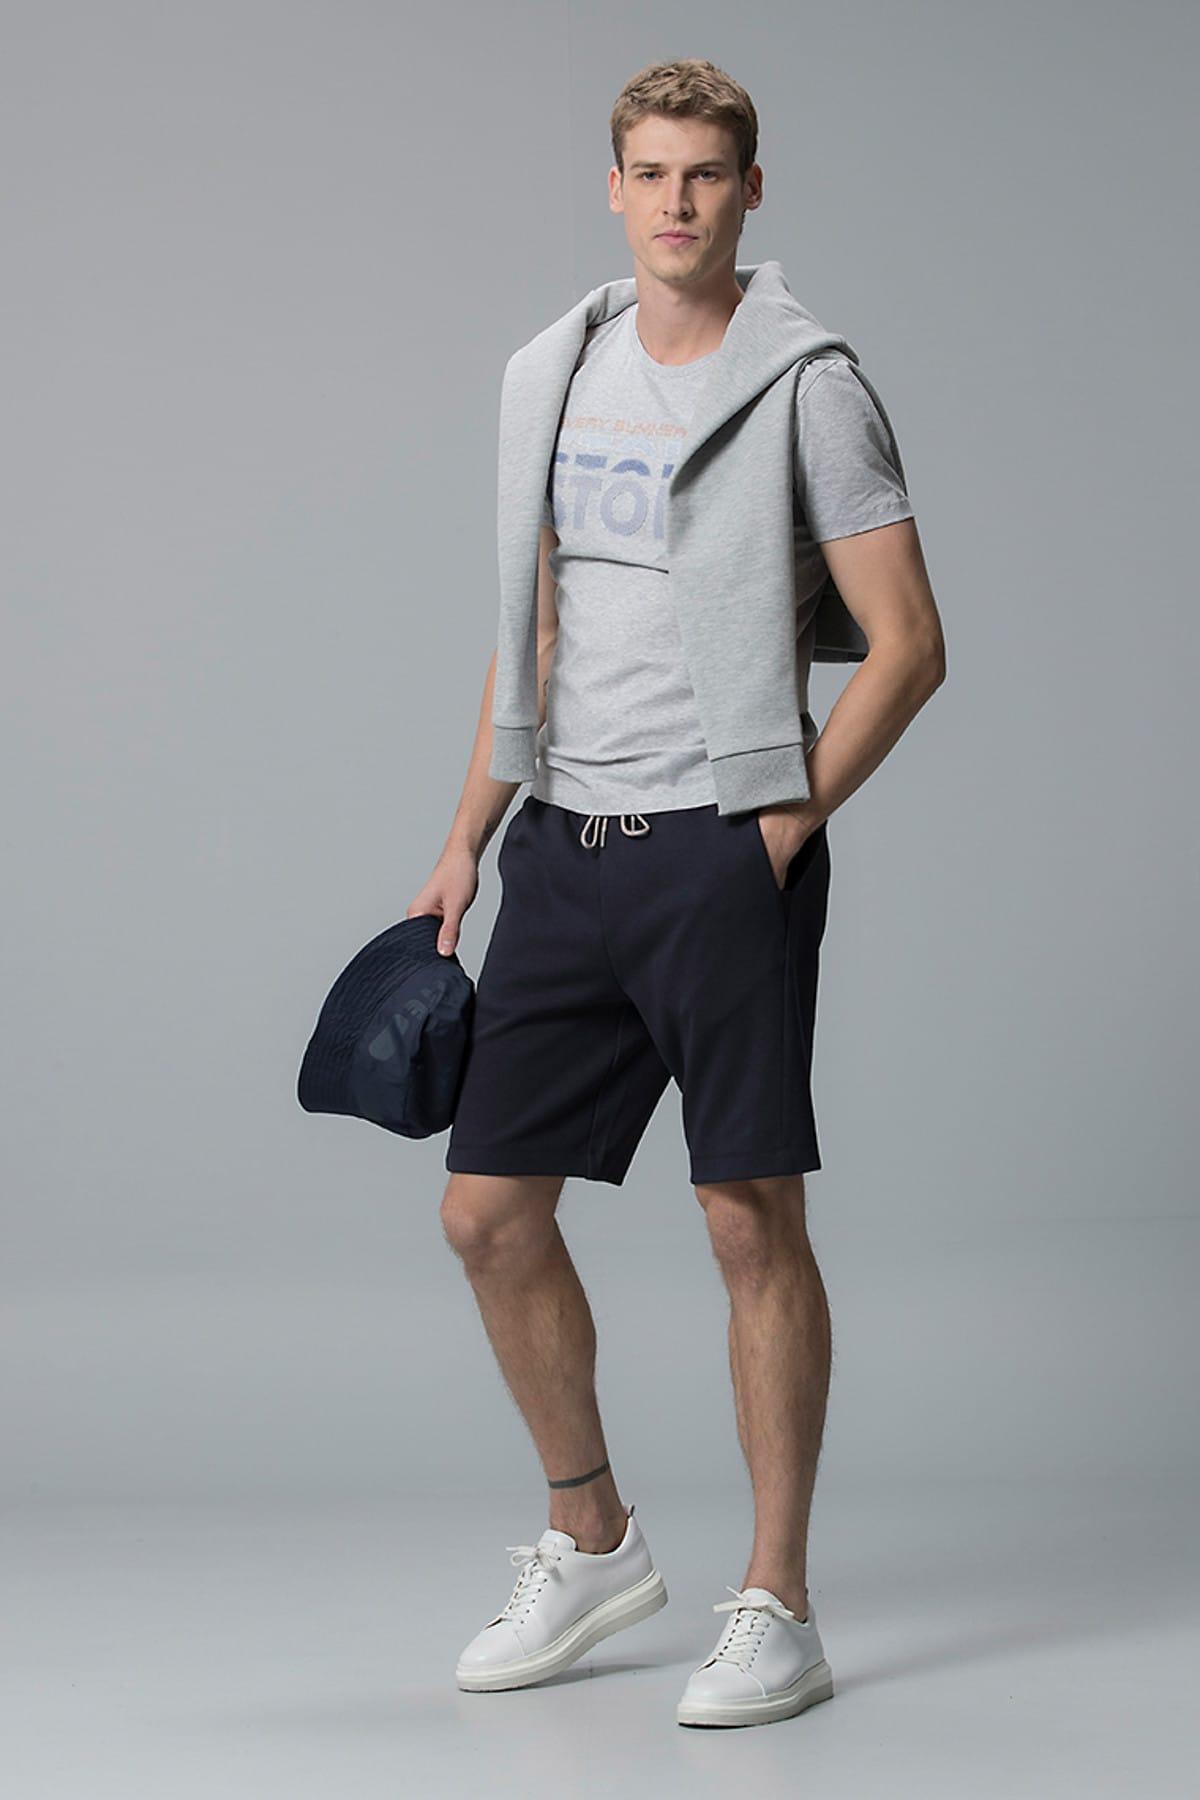 Lufian Erkek Hespores Grafik T- Shirt Açik Gri 111020011100180 1